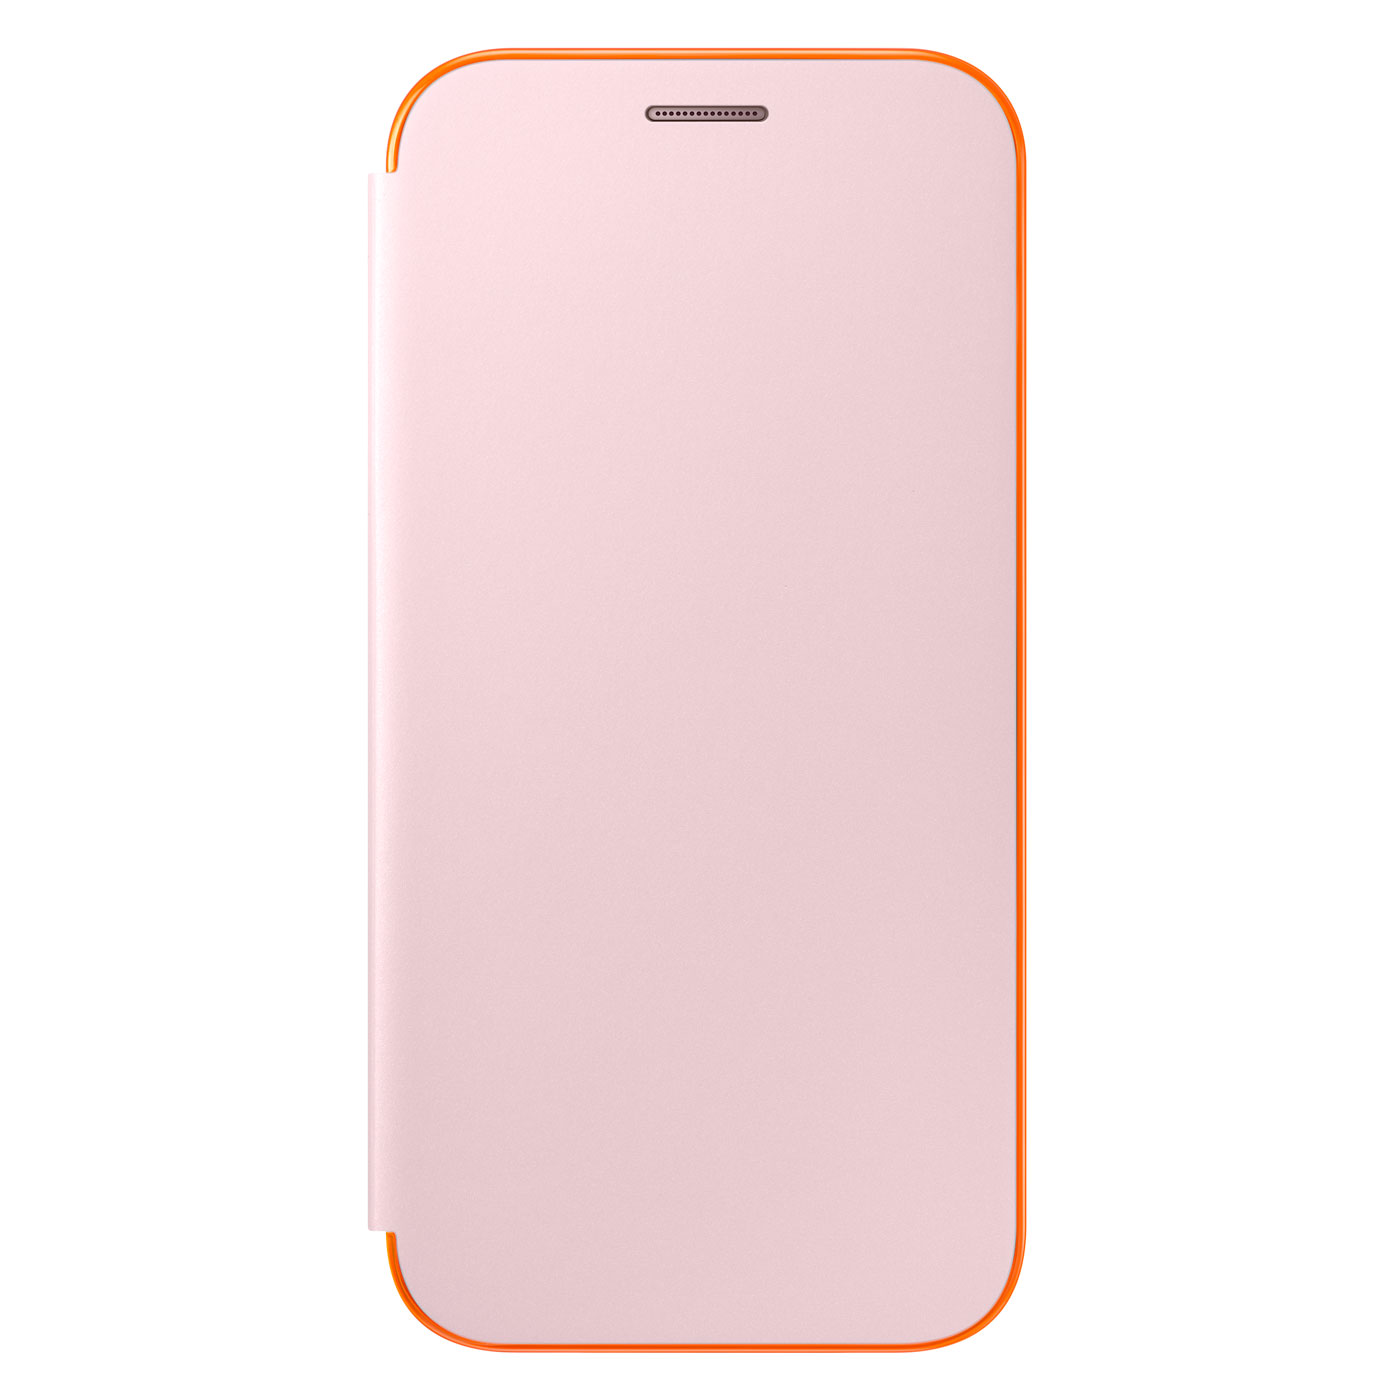 samsung flip cover neon rose samsung galaxy a5 2017 etui t l phone samsung sur. Black Bedroom Furniture Sets. Home Design Ideas